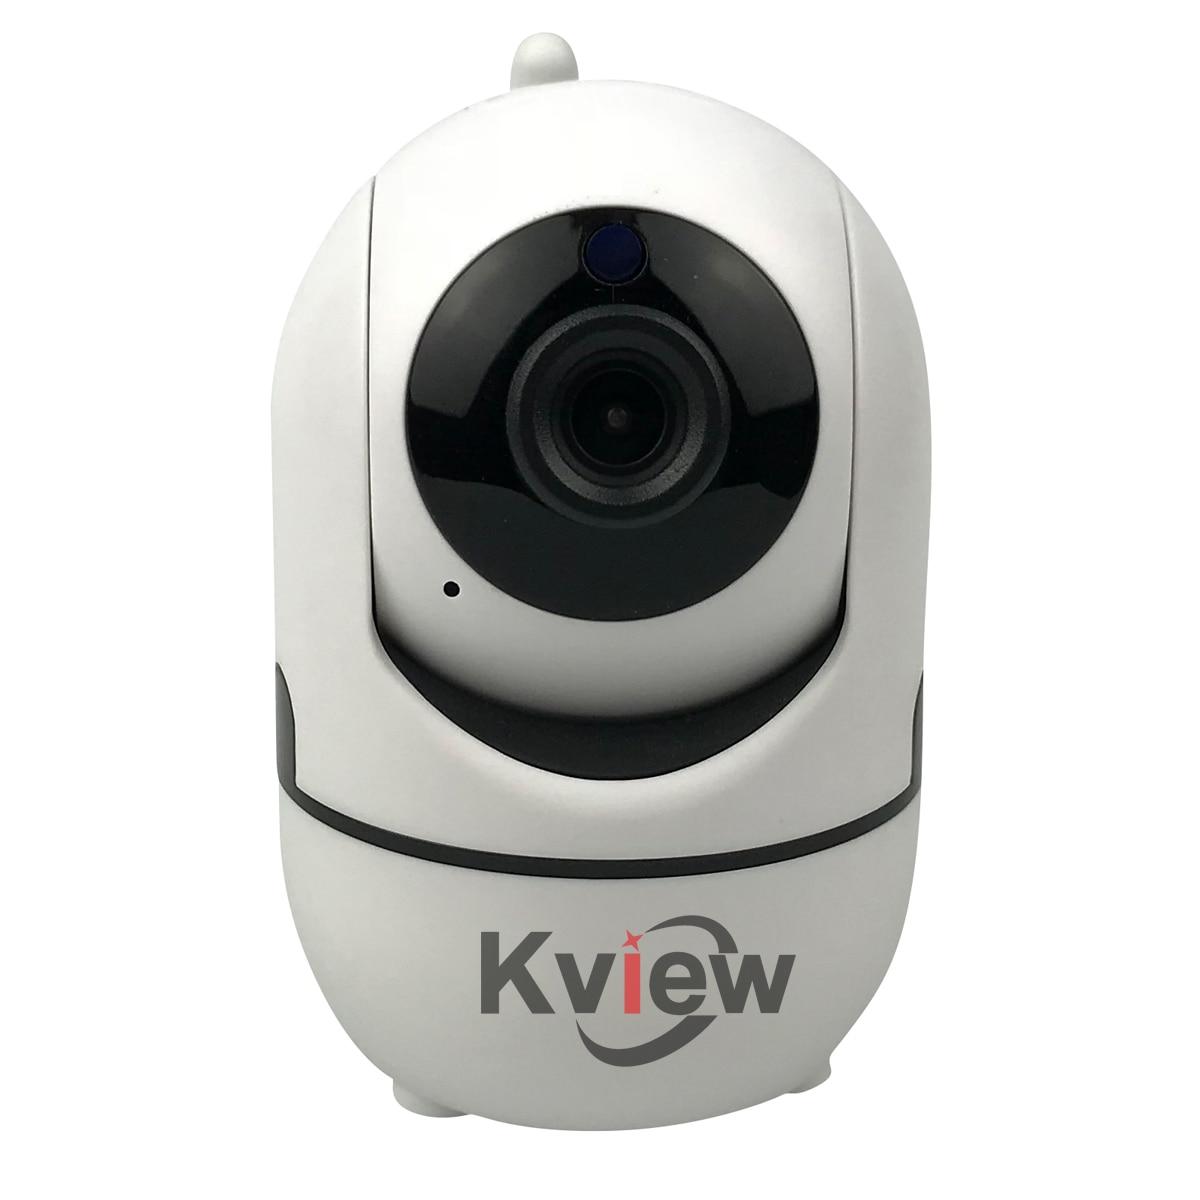 Vanxse CCTV 2MP 1080P Wifi Wireless Network IP Camera  Pan/Tilt Night Vision Security Surveillance Camera<br>